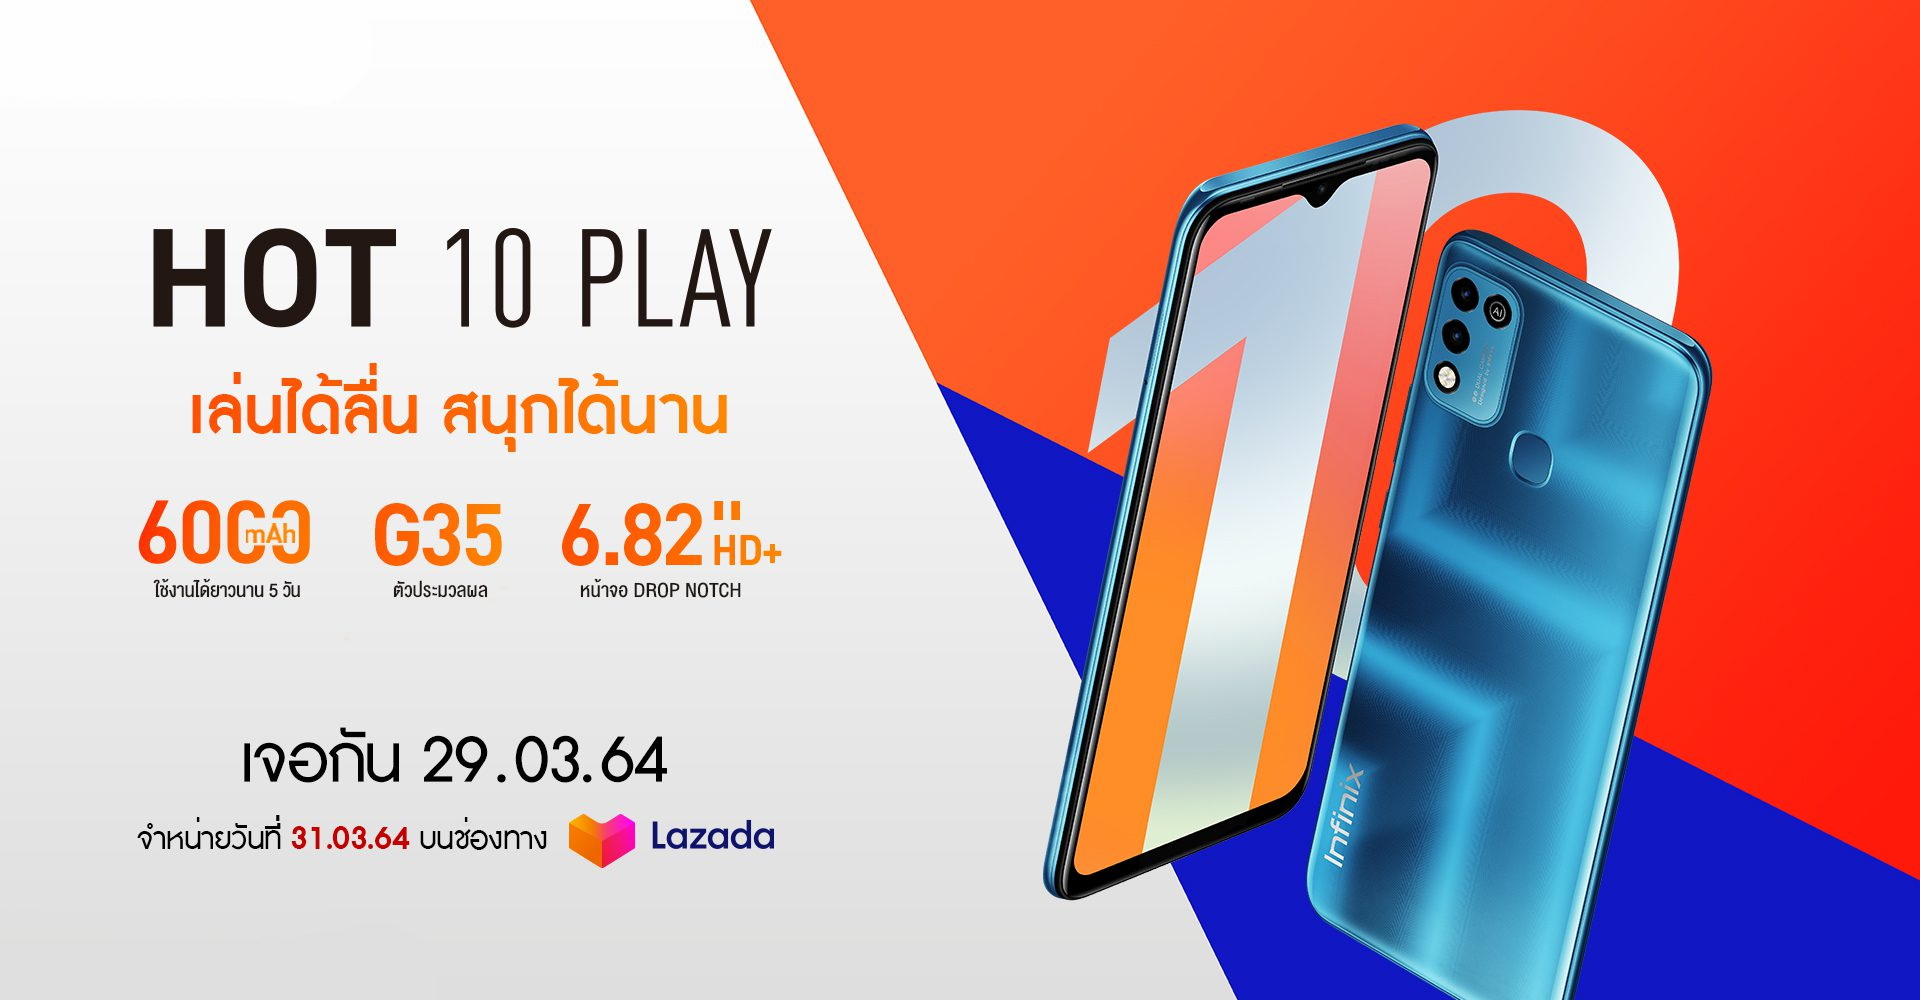 Infinix เตรียมเปิดตัวสมาร์ตโฟนรุ่นใหม่ HOT 10 PLAY  มือถือแบตอึด! 6,000 mAh ในราคาไม่เกิน 4,000 บาท  วางขายวันที่ 31 มีนาคมนี้ พร้อมกันทั่วประเทศ